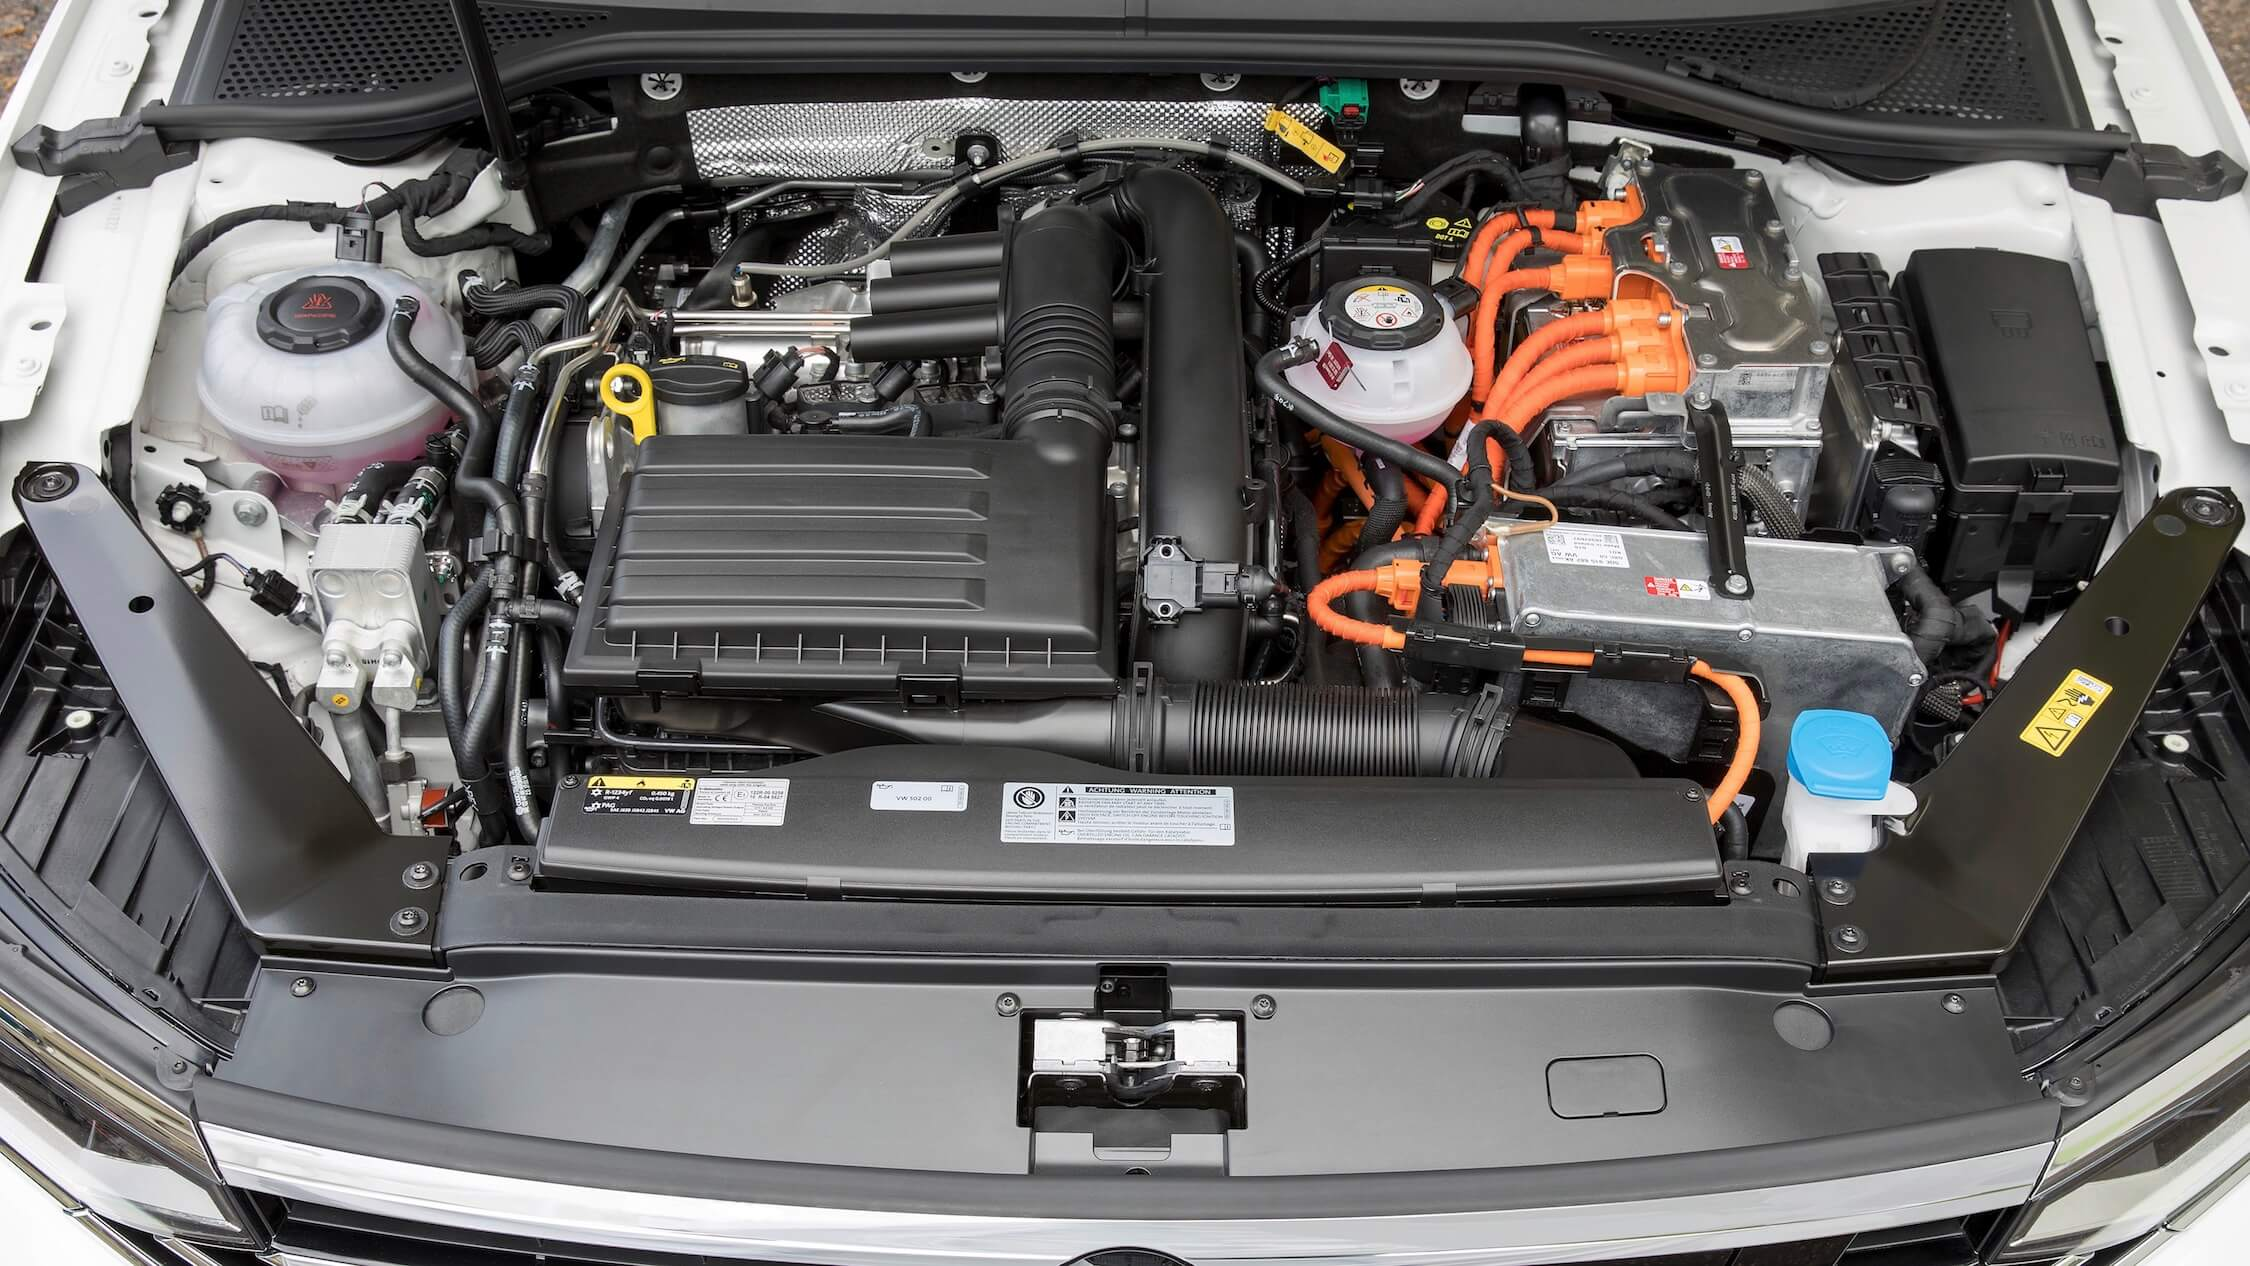 VW Passat GTE motor